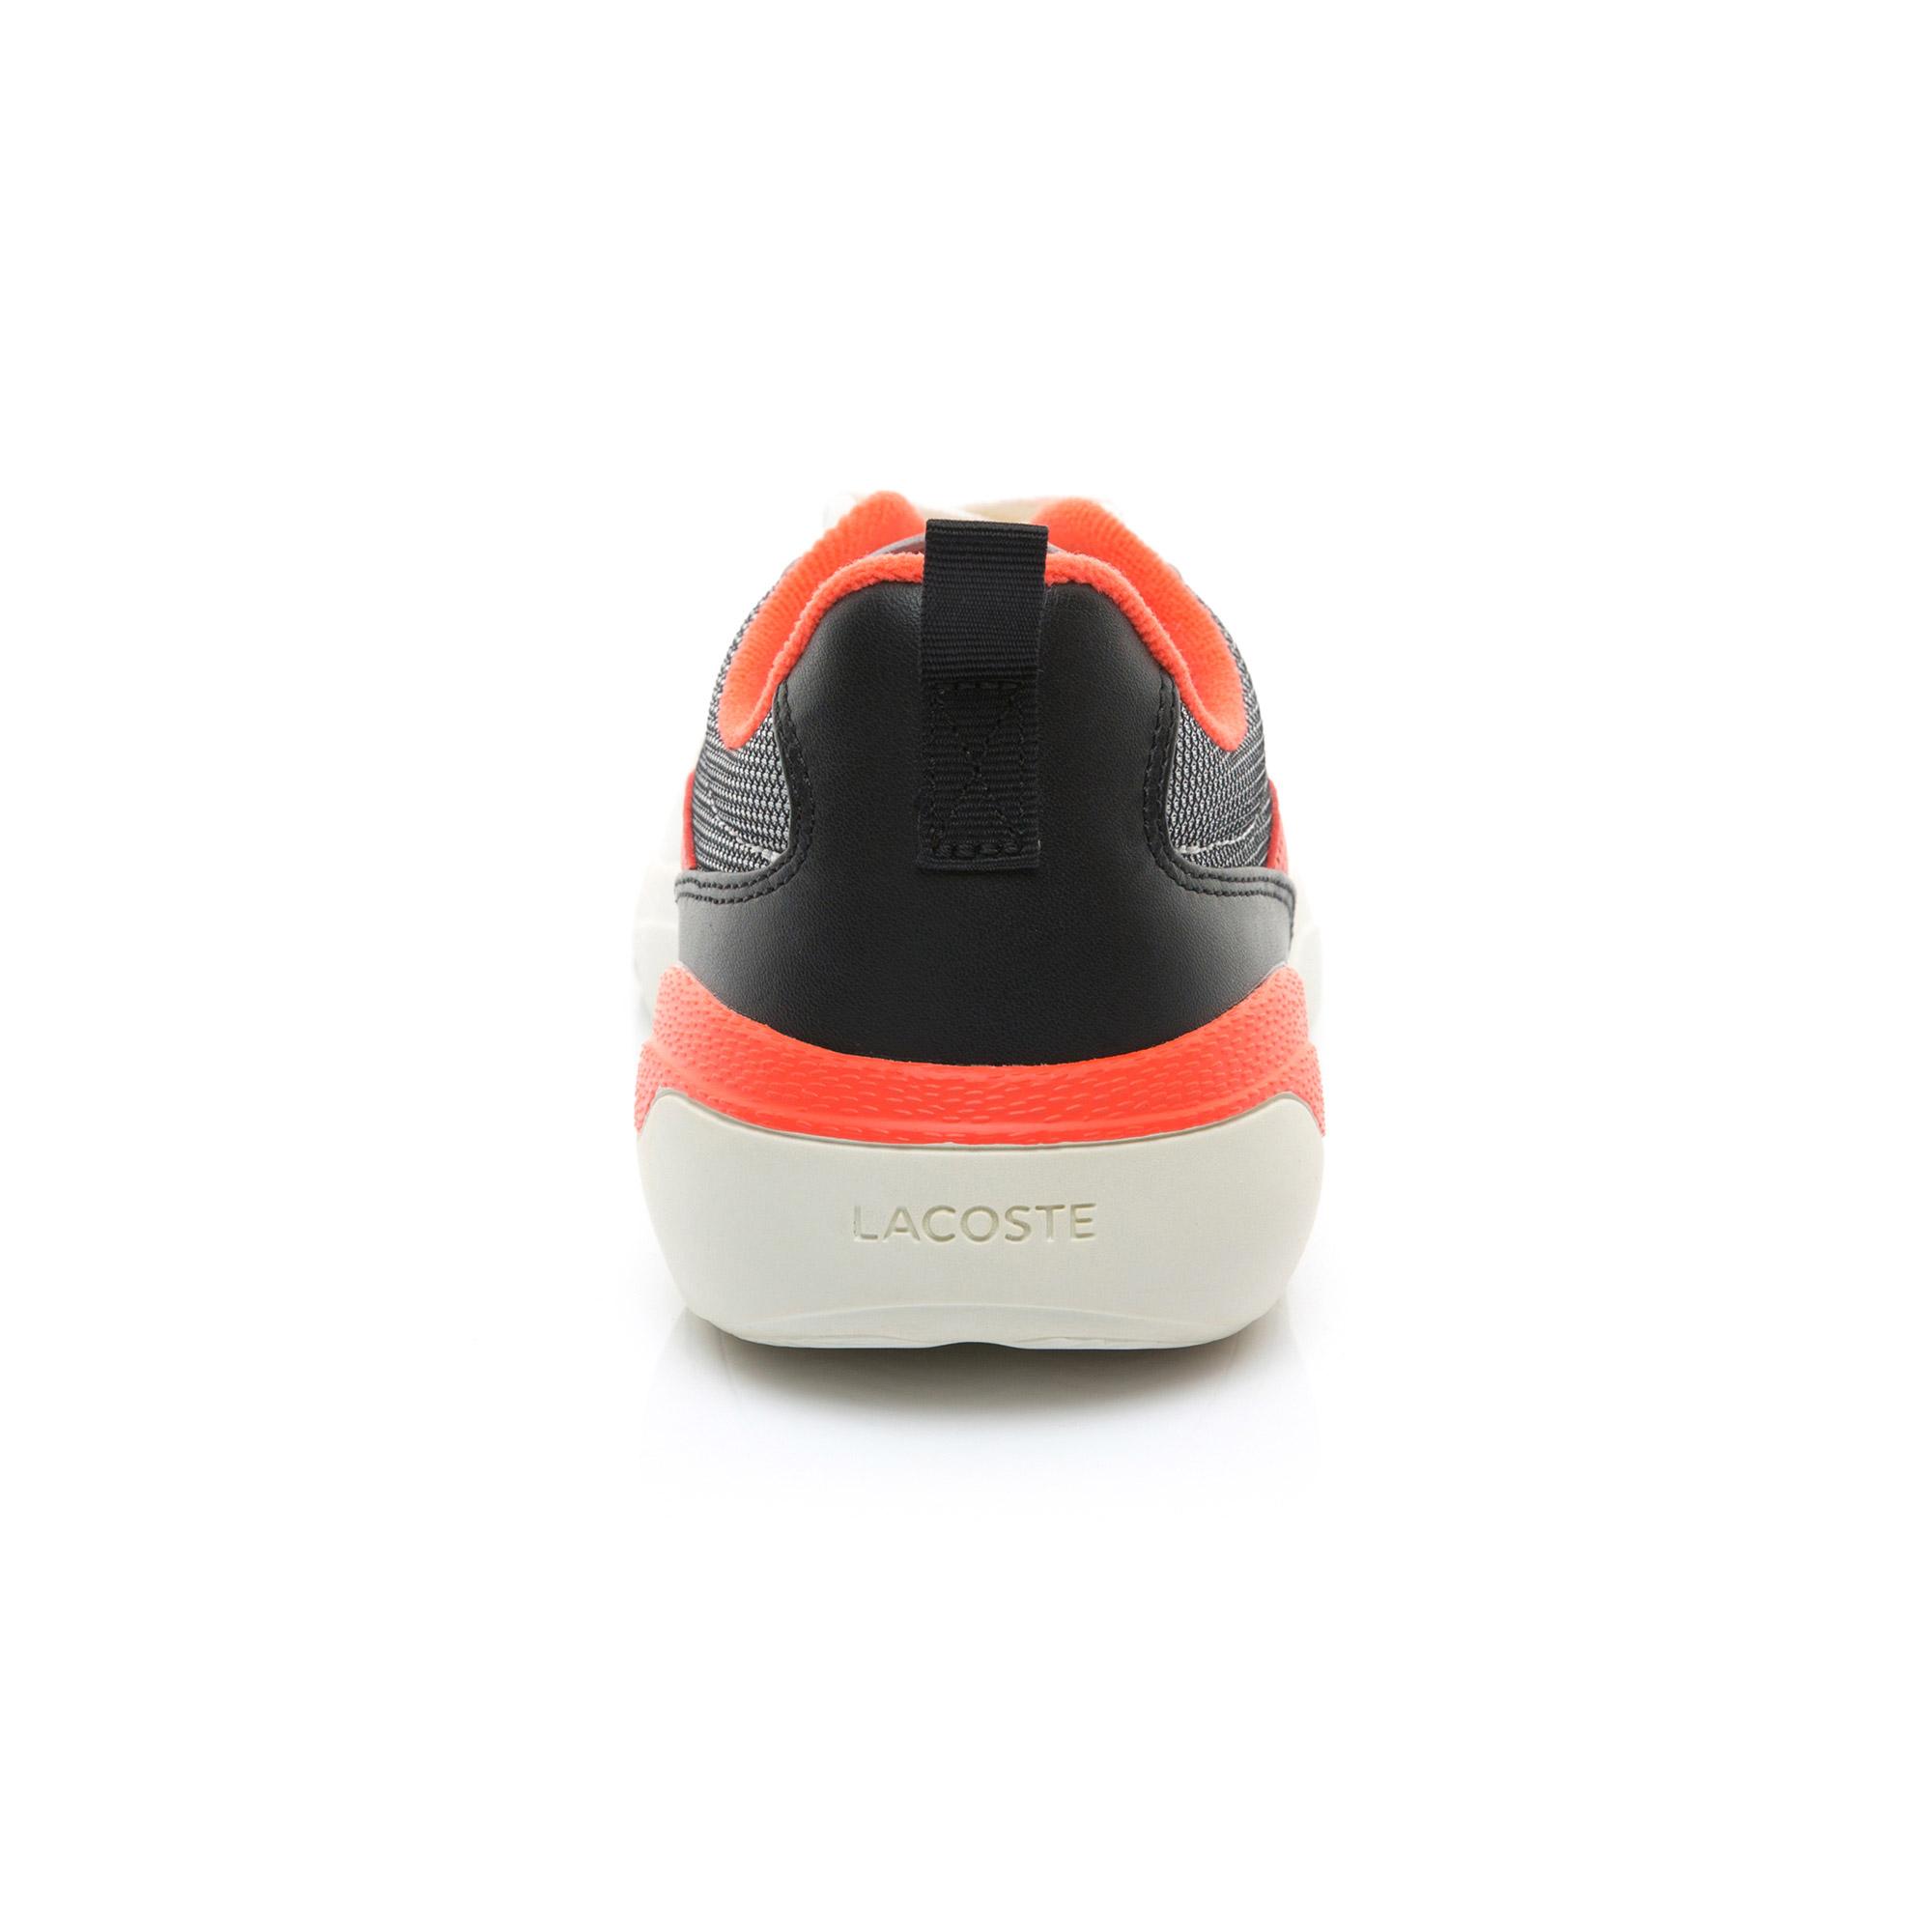 Lacoste Erkek Bej - Pembe Wildcard 219 1 Spor Ayakkabı